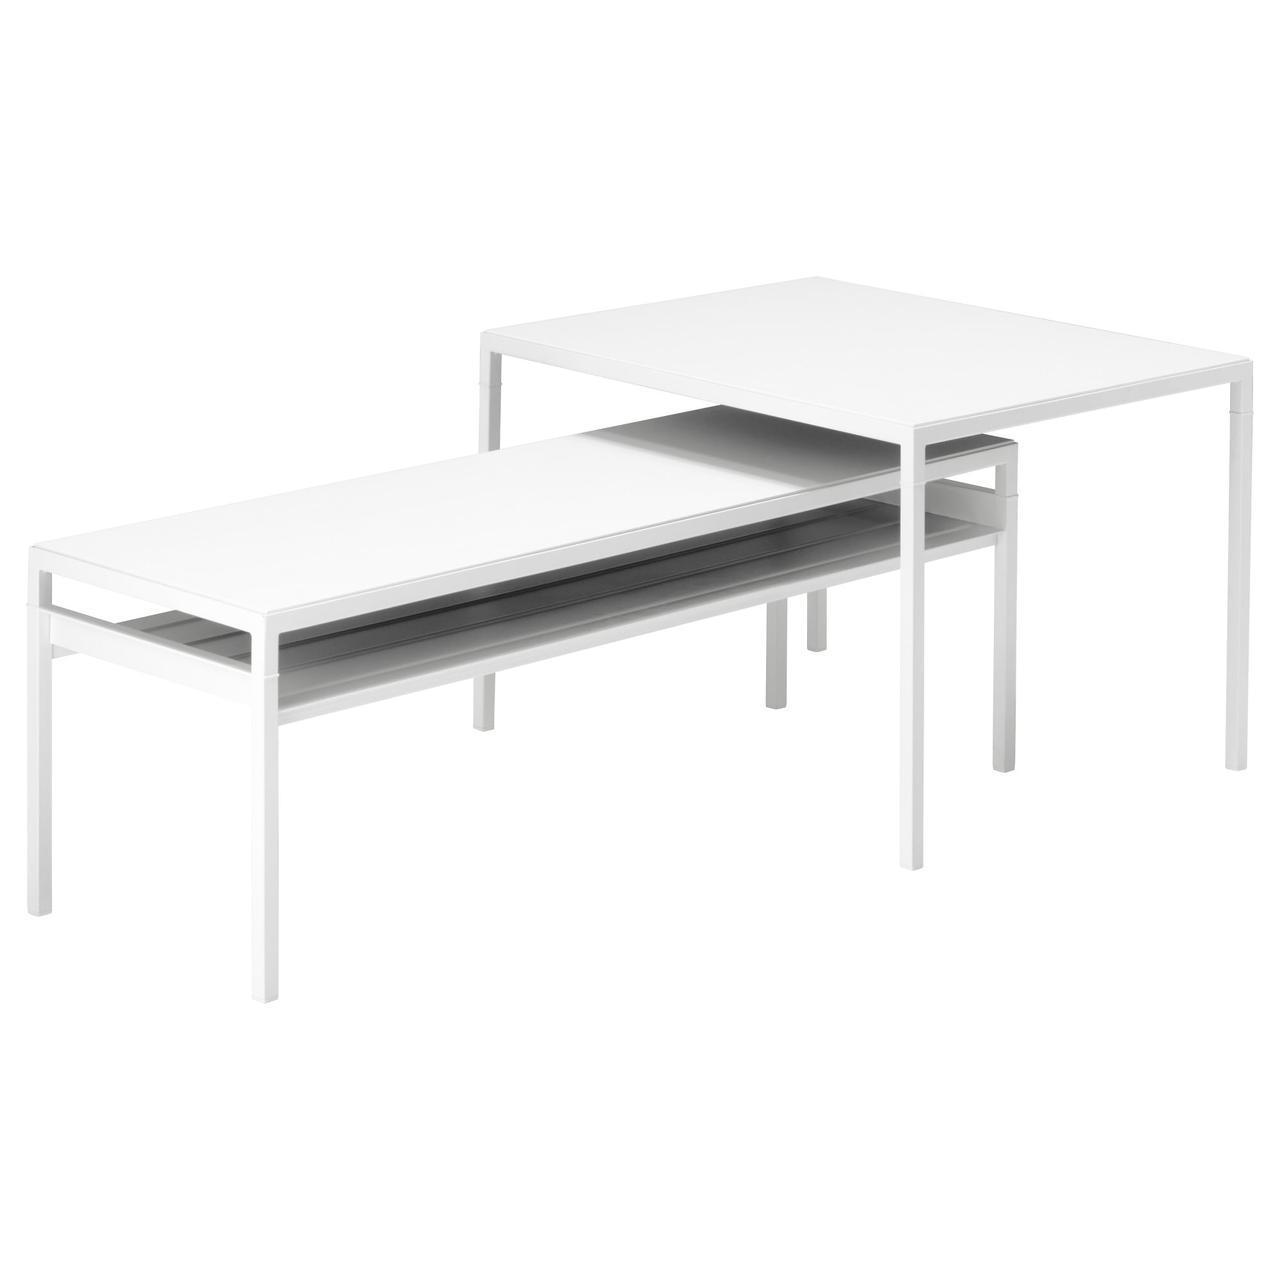 IKEA NYBODA (292.083.25) Столы с двухсторонним верхним, 2 шт., Черный/белый